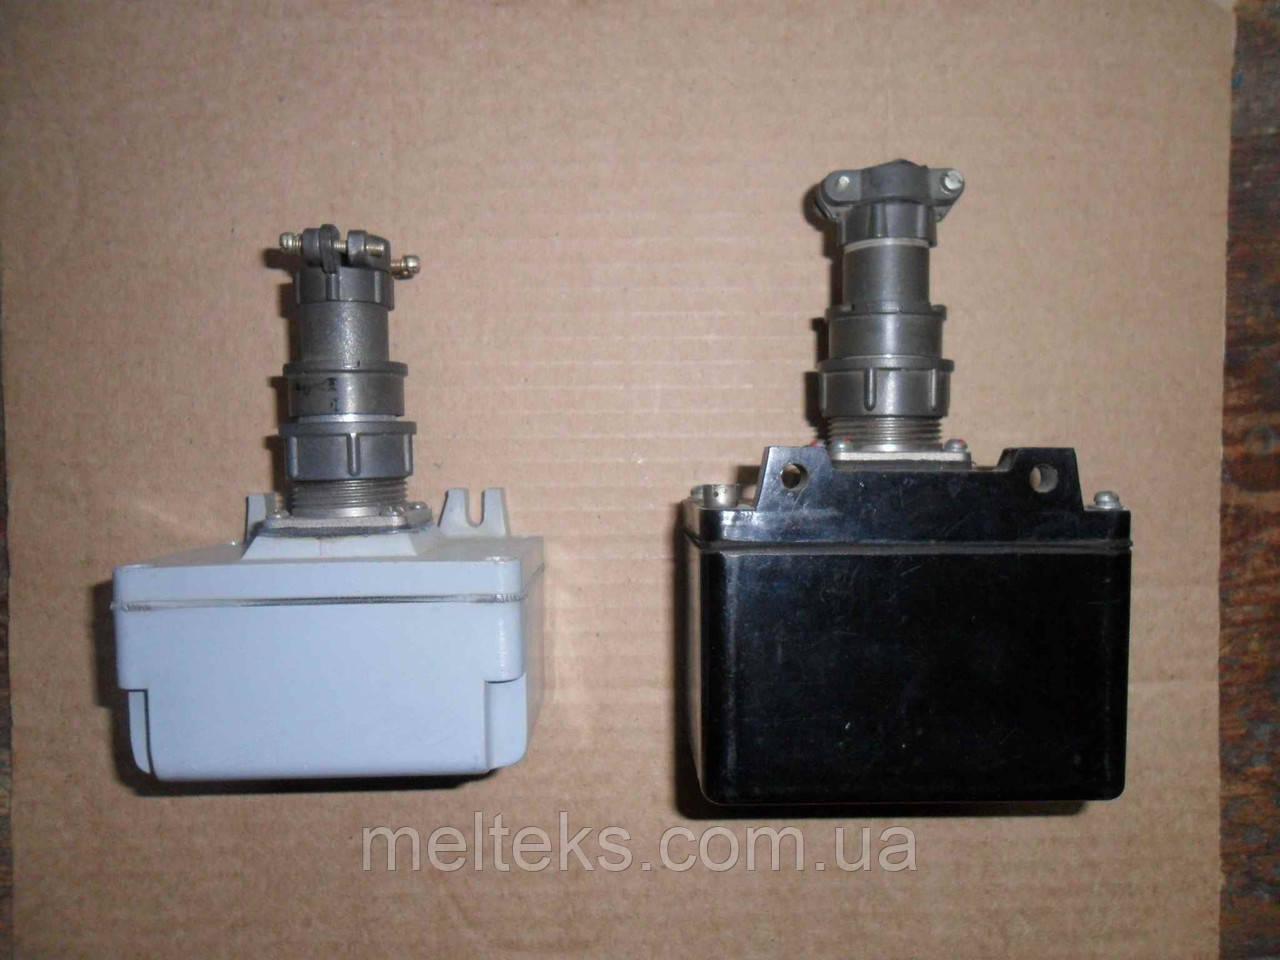 Термореле ТРЭ-2М, ТРЭ-2, ТРЭ-201 с терморезисторами СТ 14